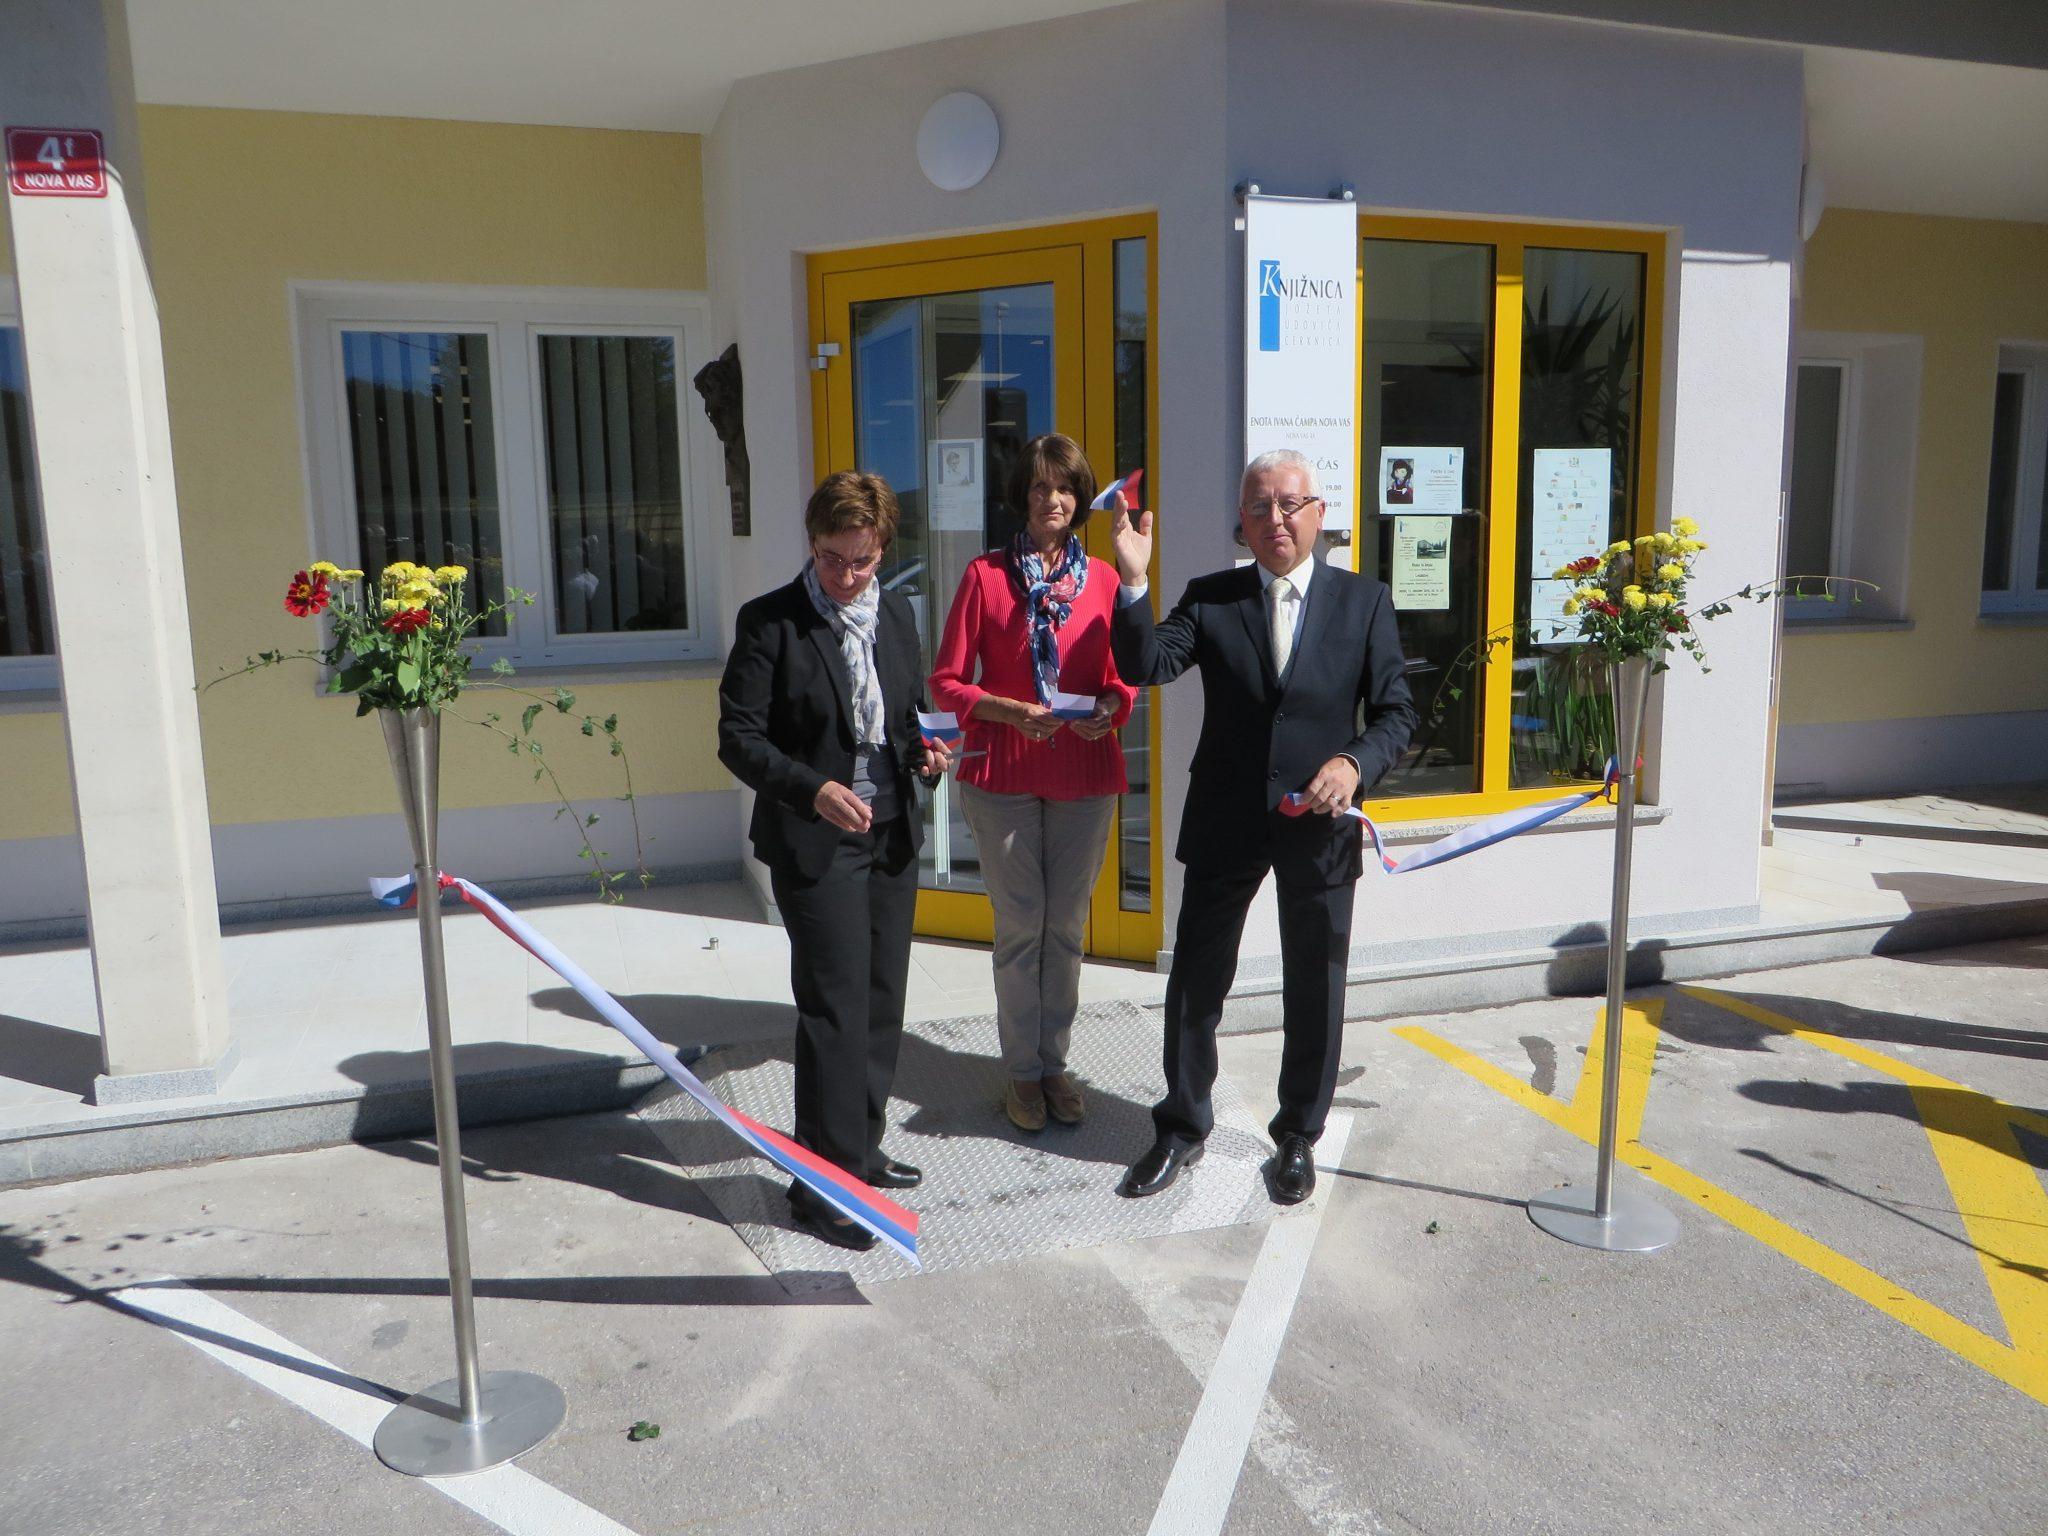 IMG 5312 - Odprtje novih prostorov KJUC – Enota Ivana Čampa Nova vas